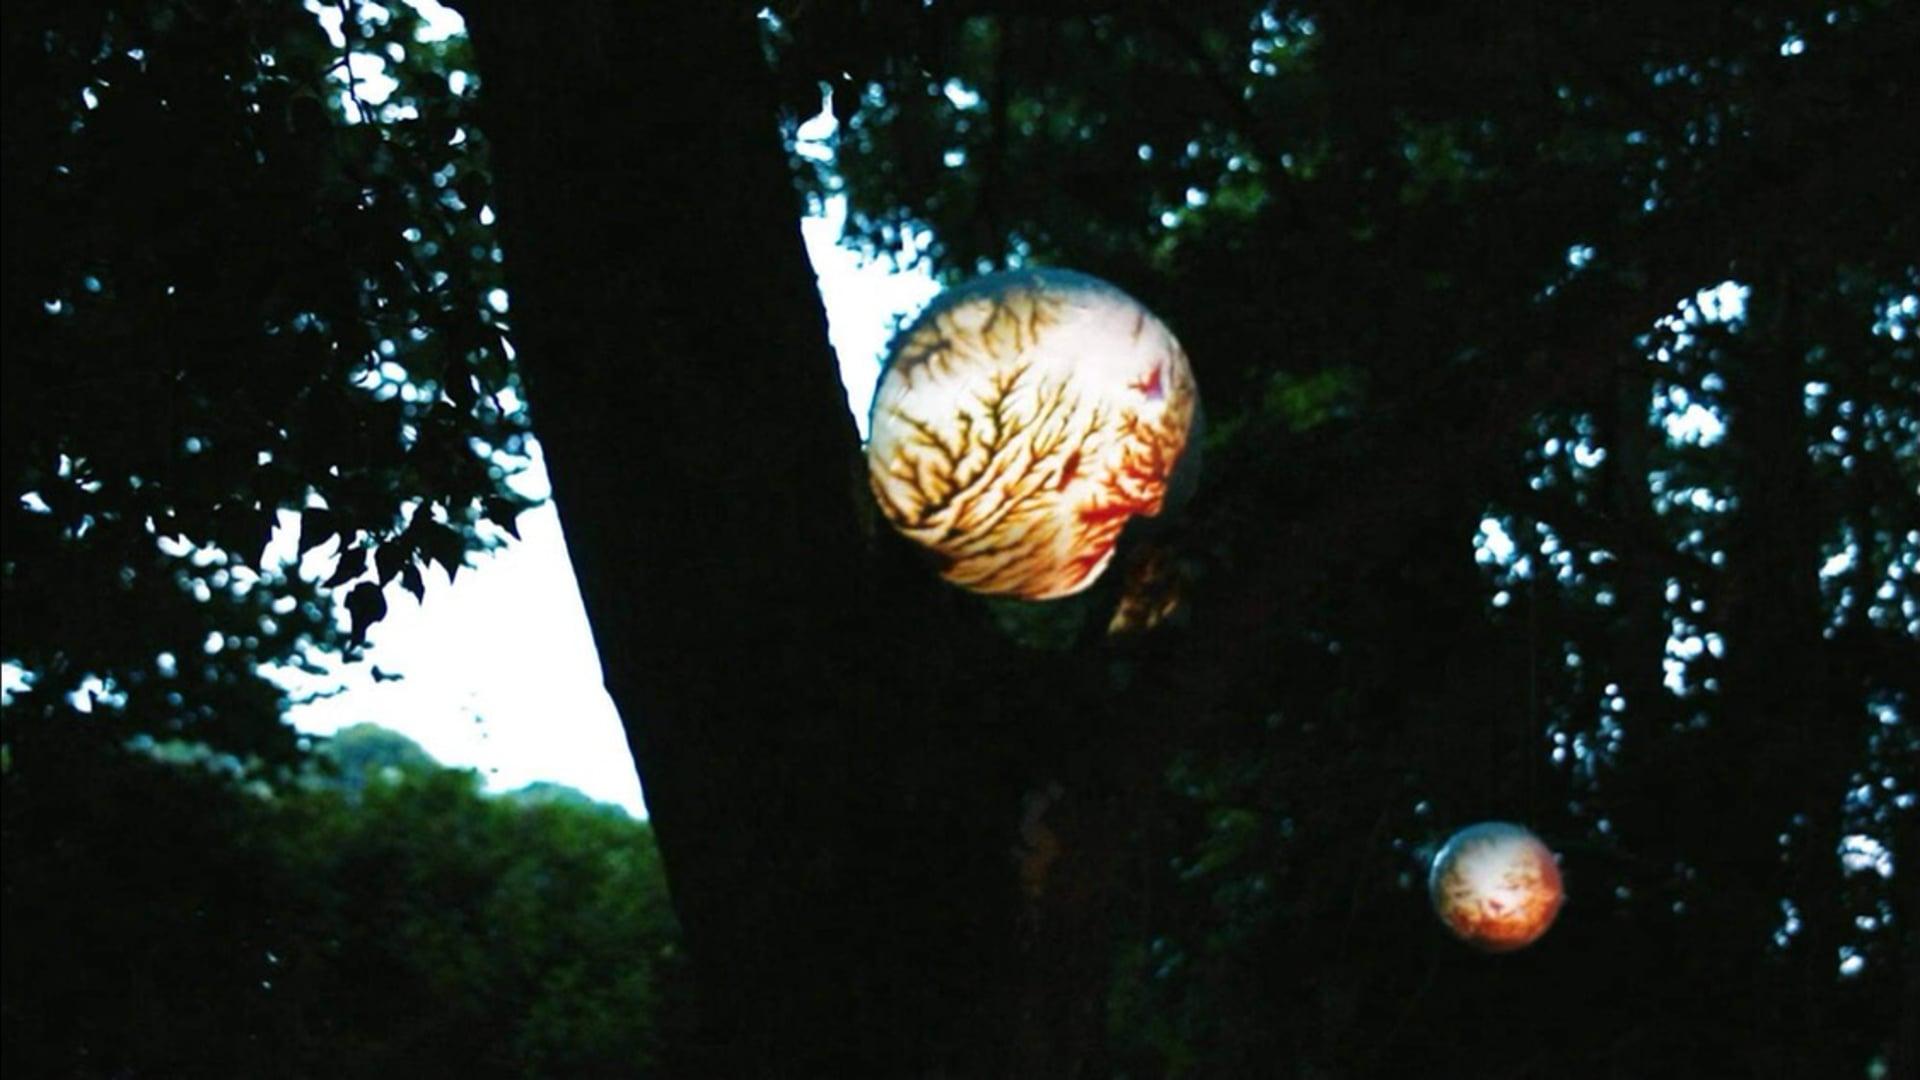 Adrena Adrena - Planet in The Woods